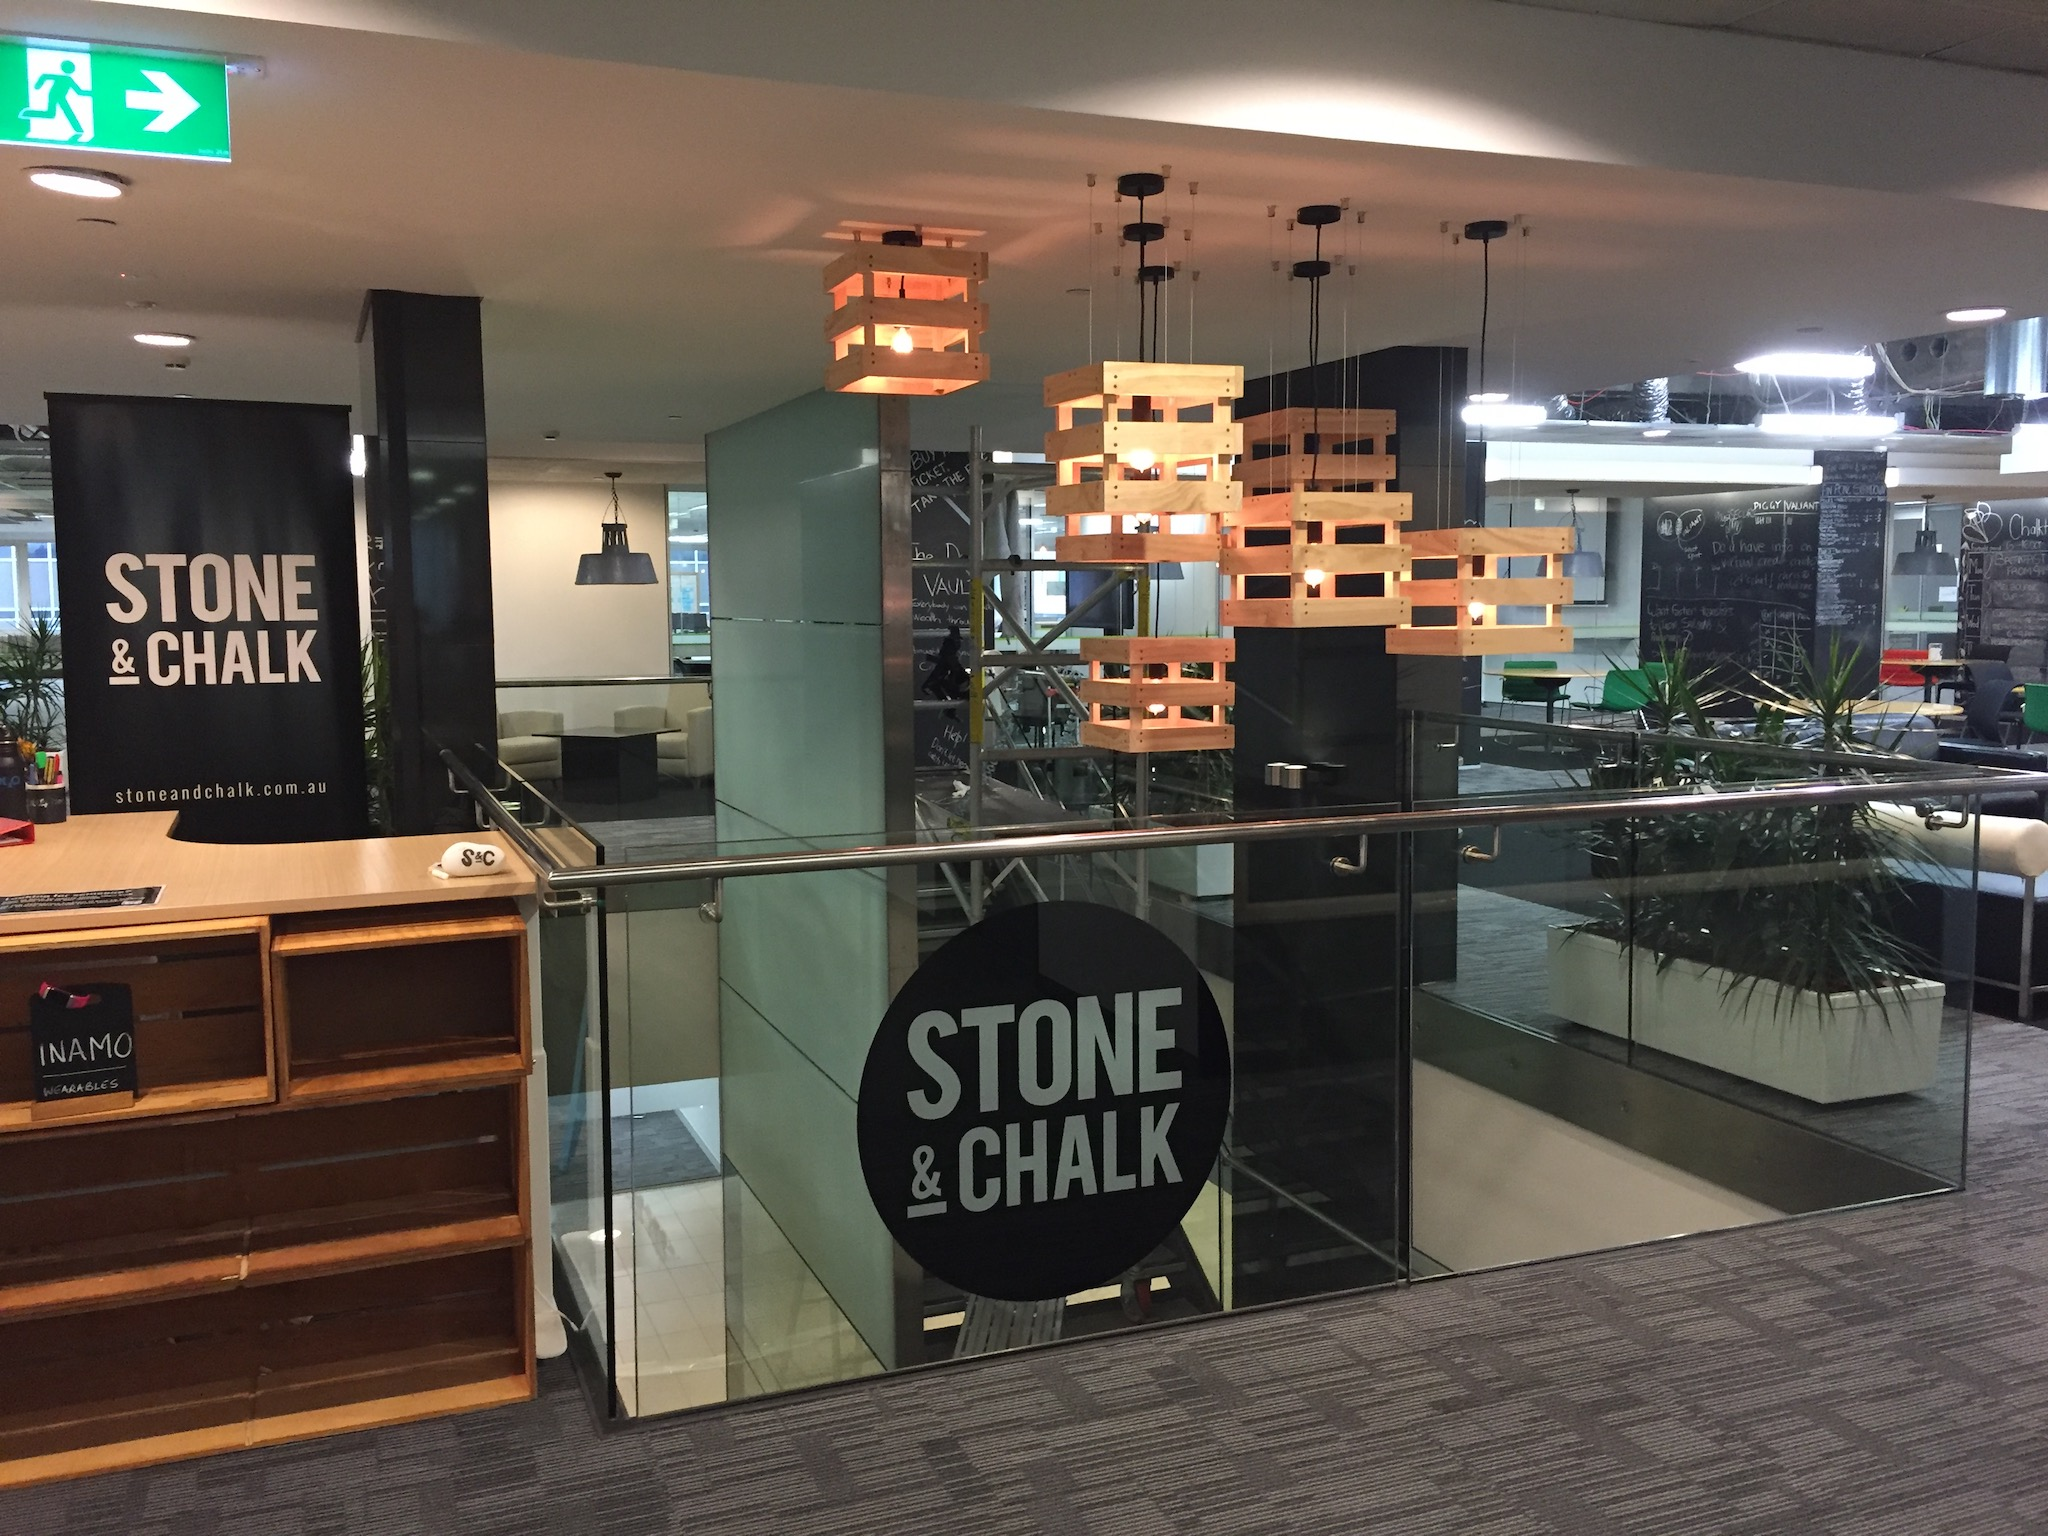 3M FASARA Glass Finishes Cielo C Stone & Chalk work in progress image 07